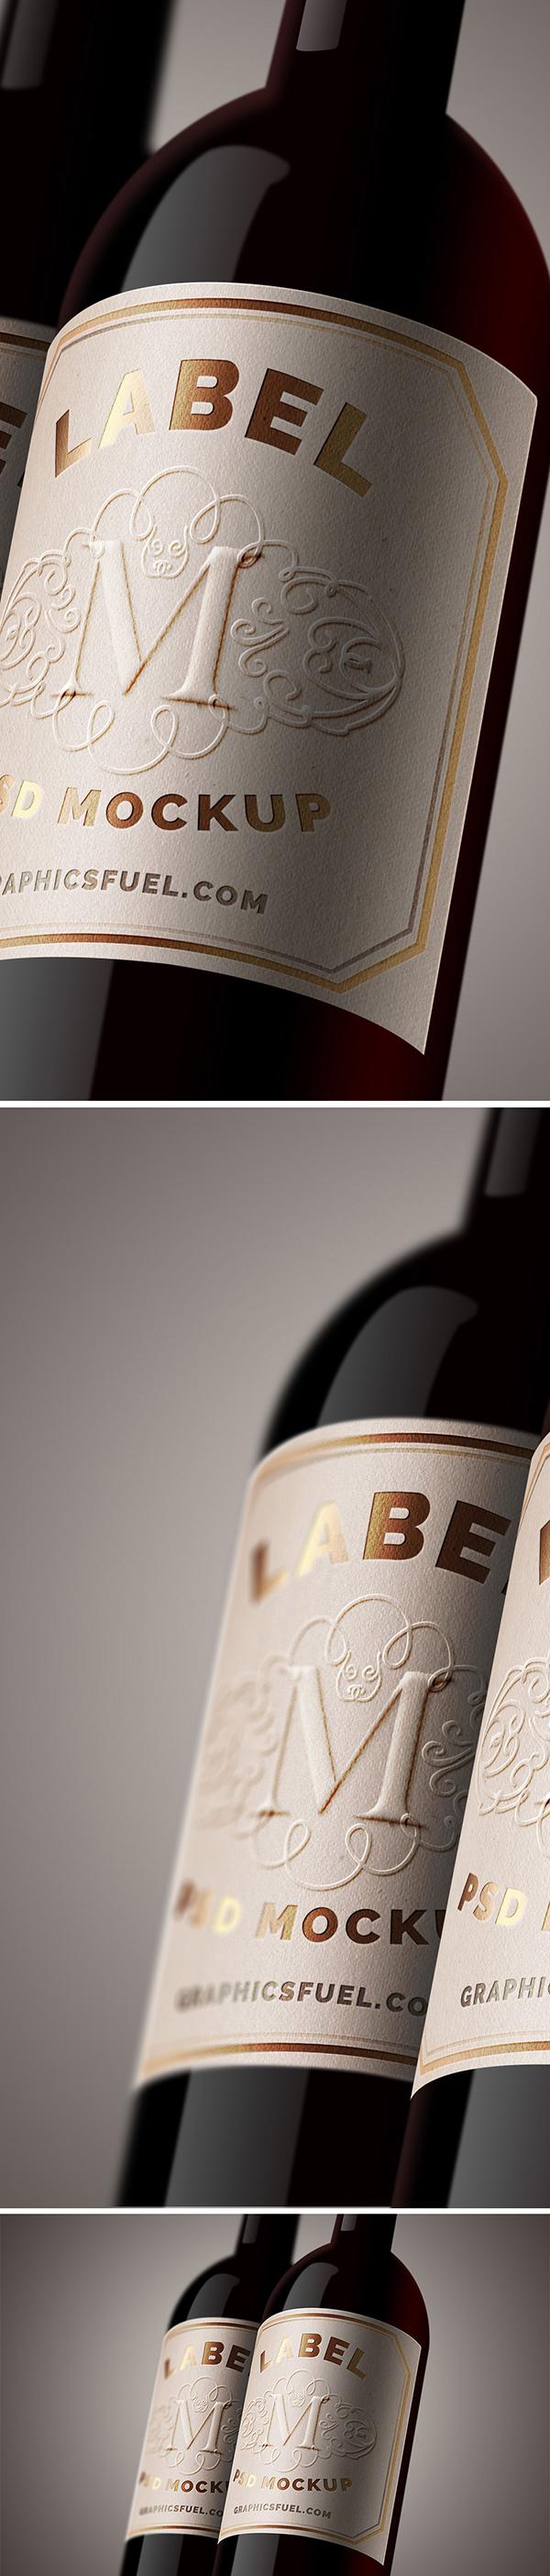 06 Free Wine Bottle Label Mockup